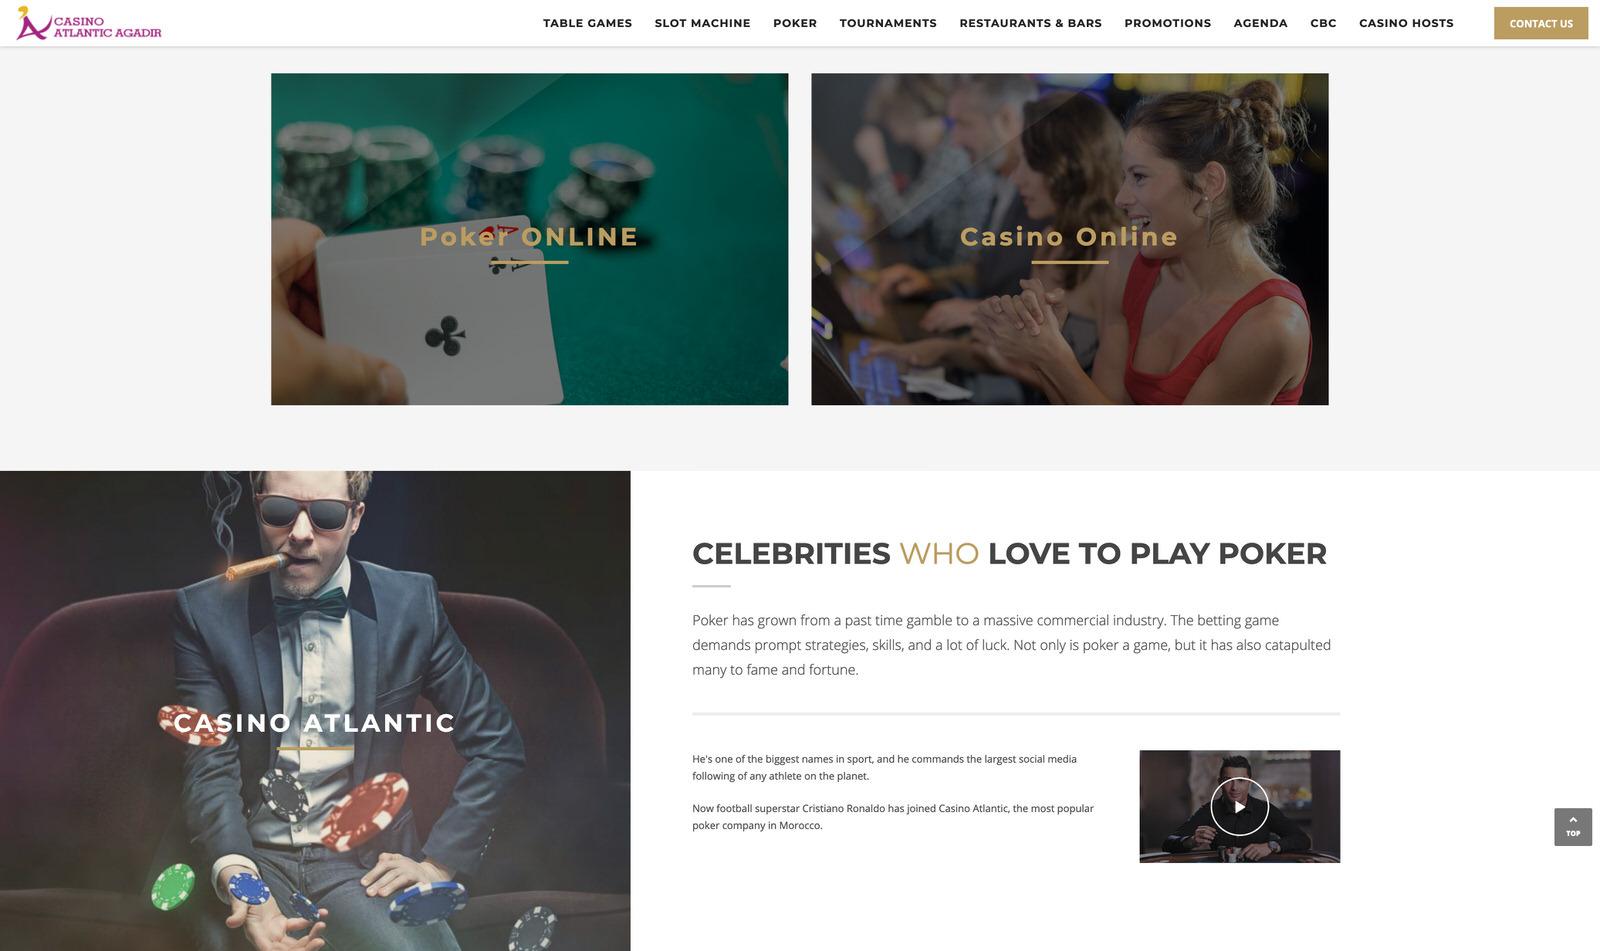 iCom-Agence-de-Communication-au-Maroc-Casablanca-creation-site-web-casini-atlantic-agadir2020-05-25 at 11.39.27 PM 3